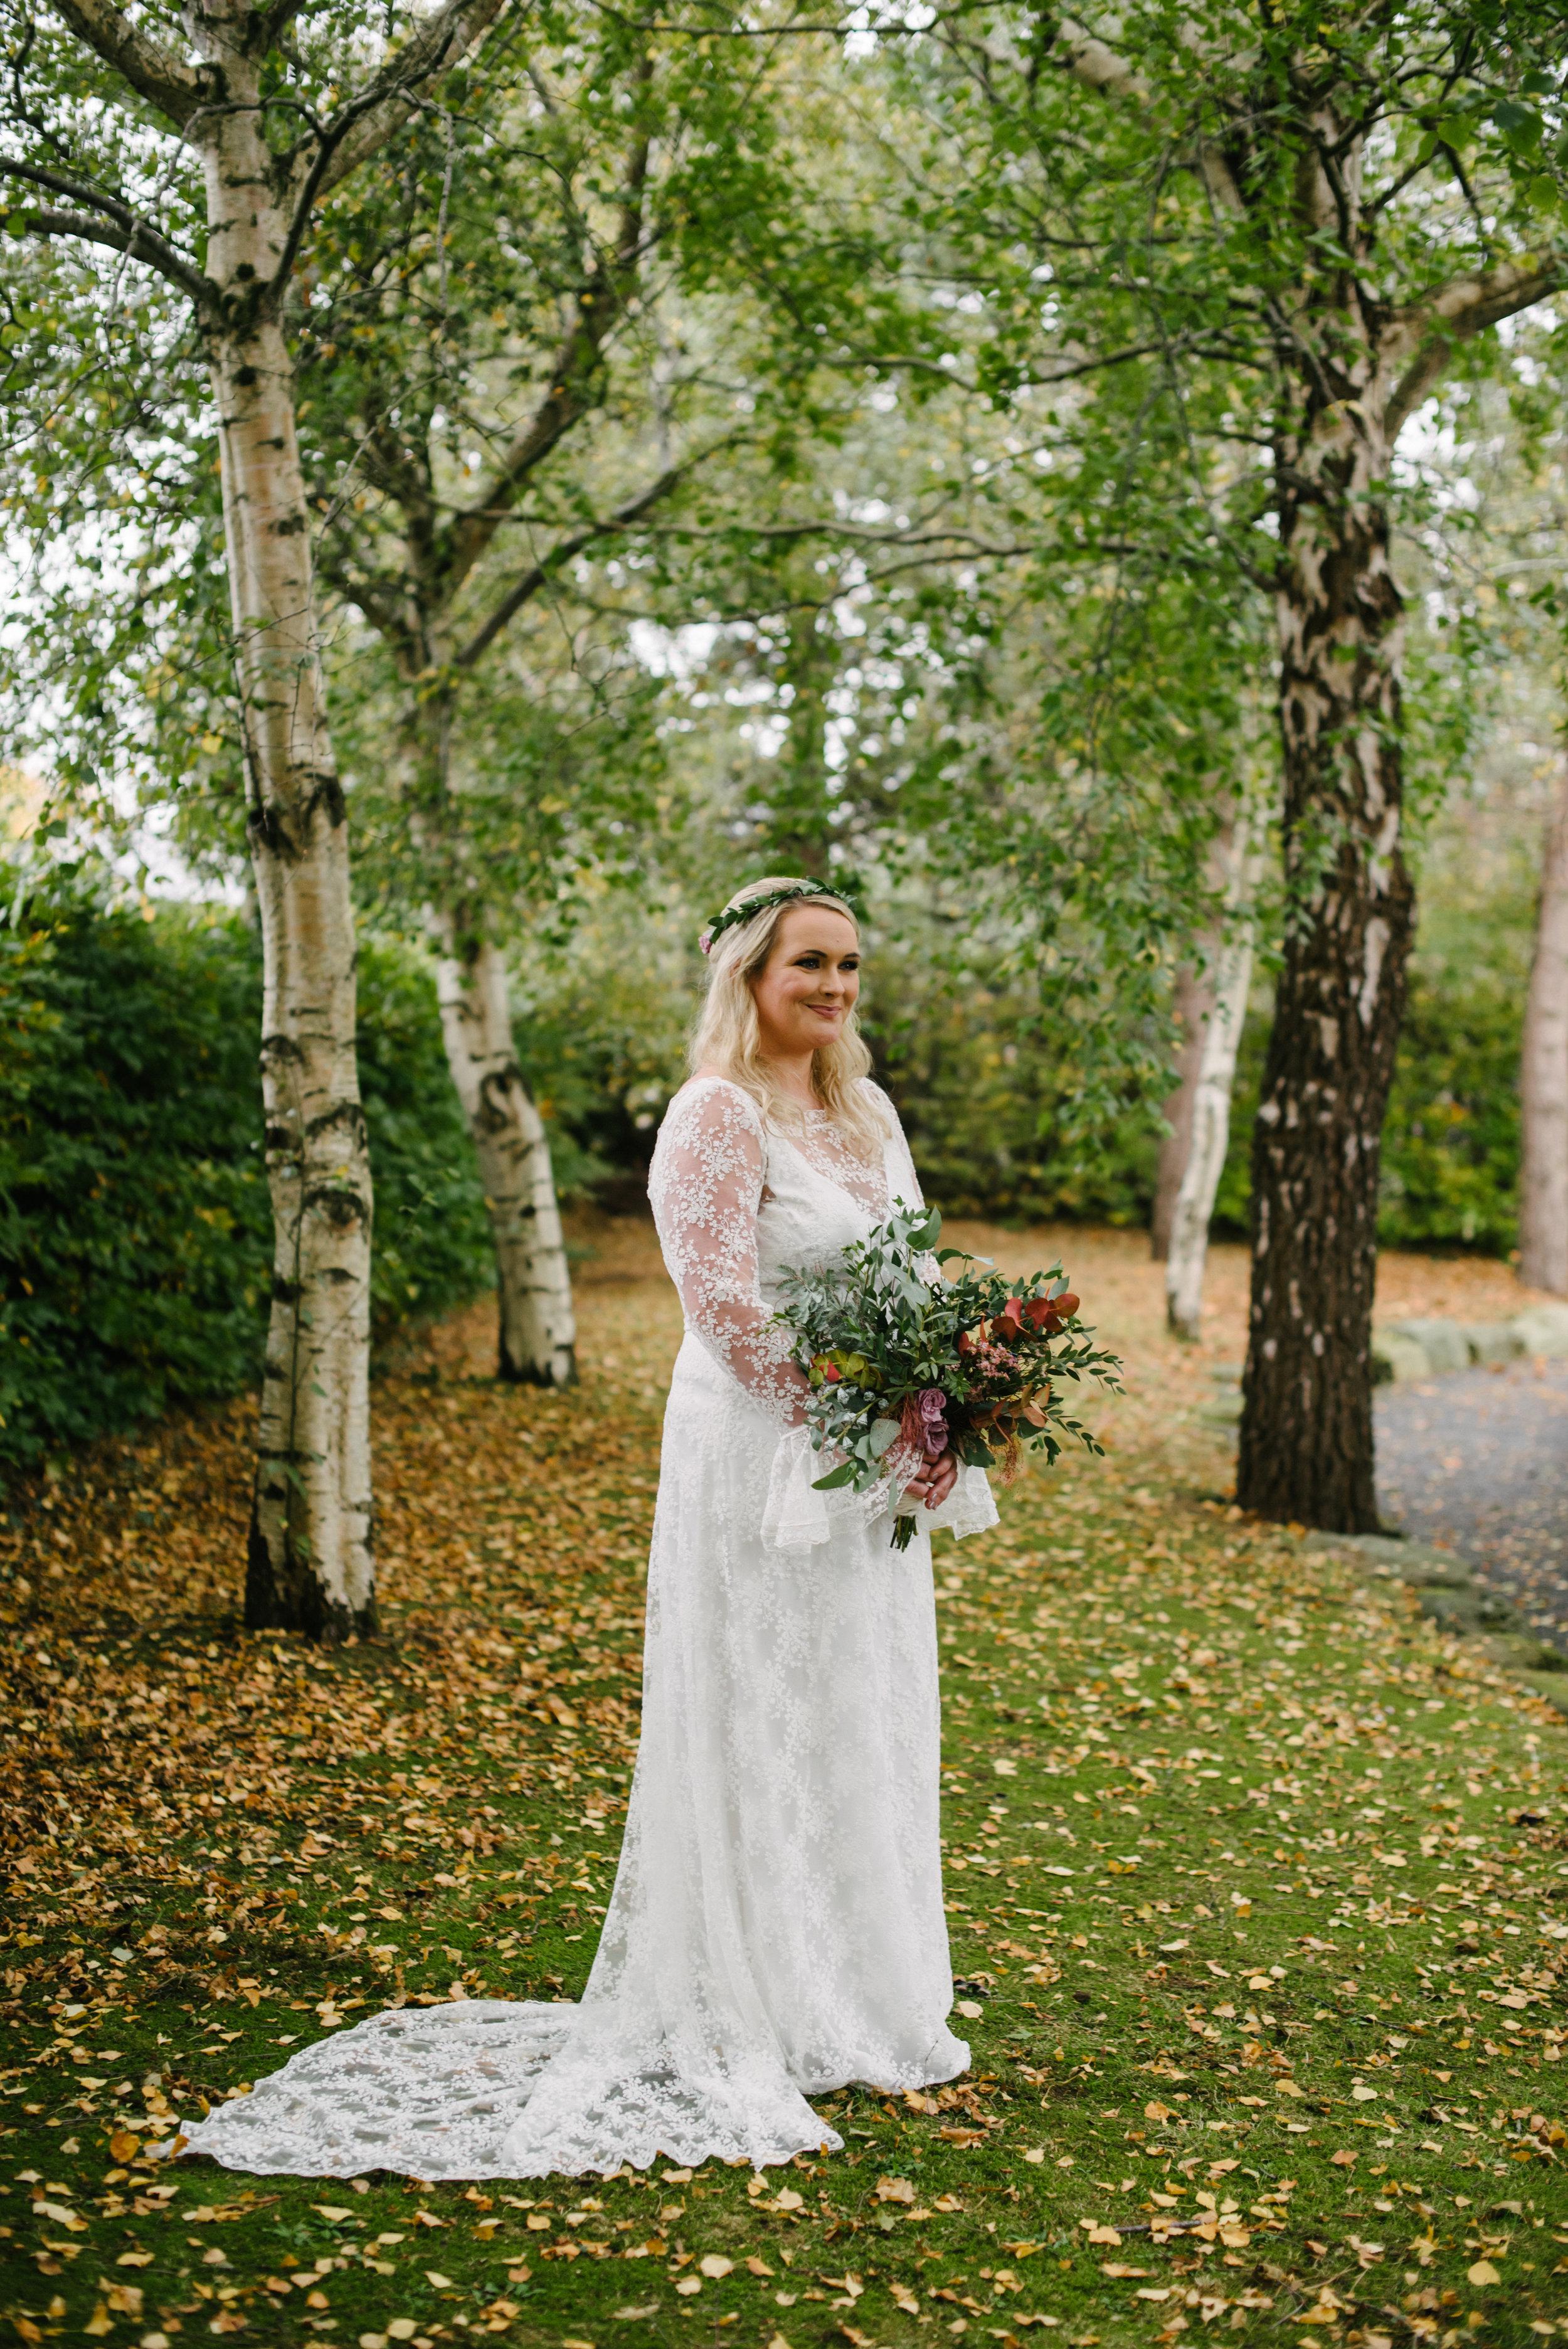 BOHEMIAN BRIDE IRELAND